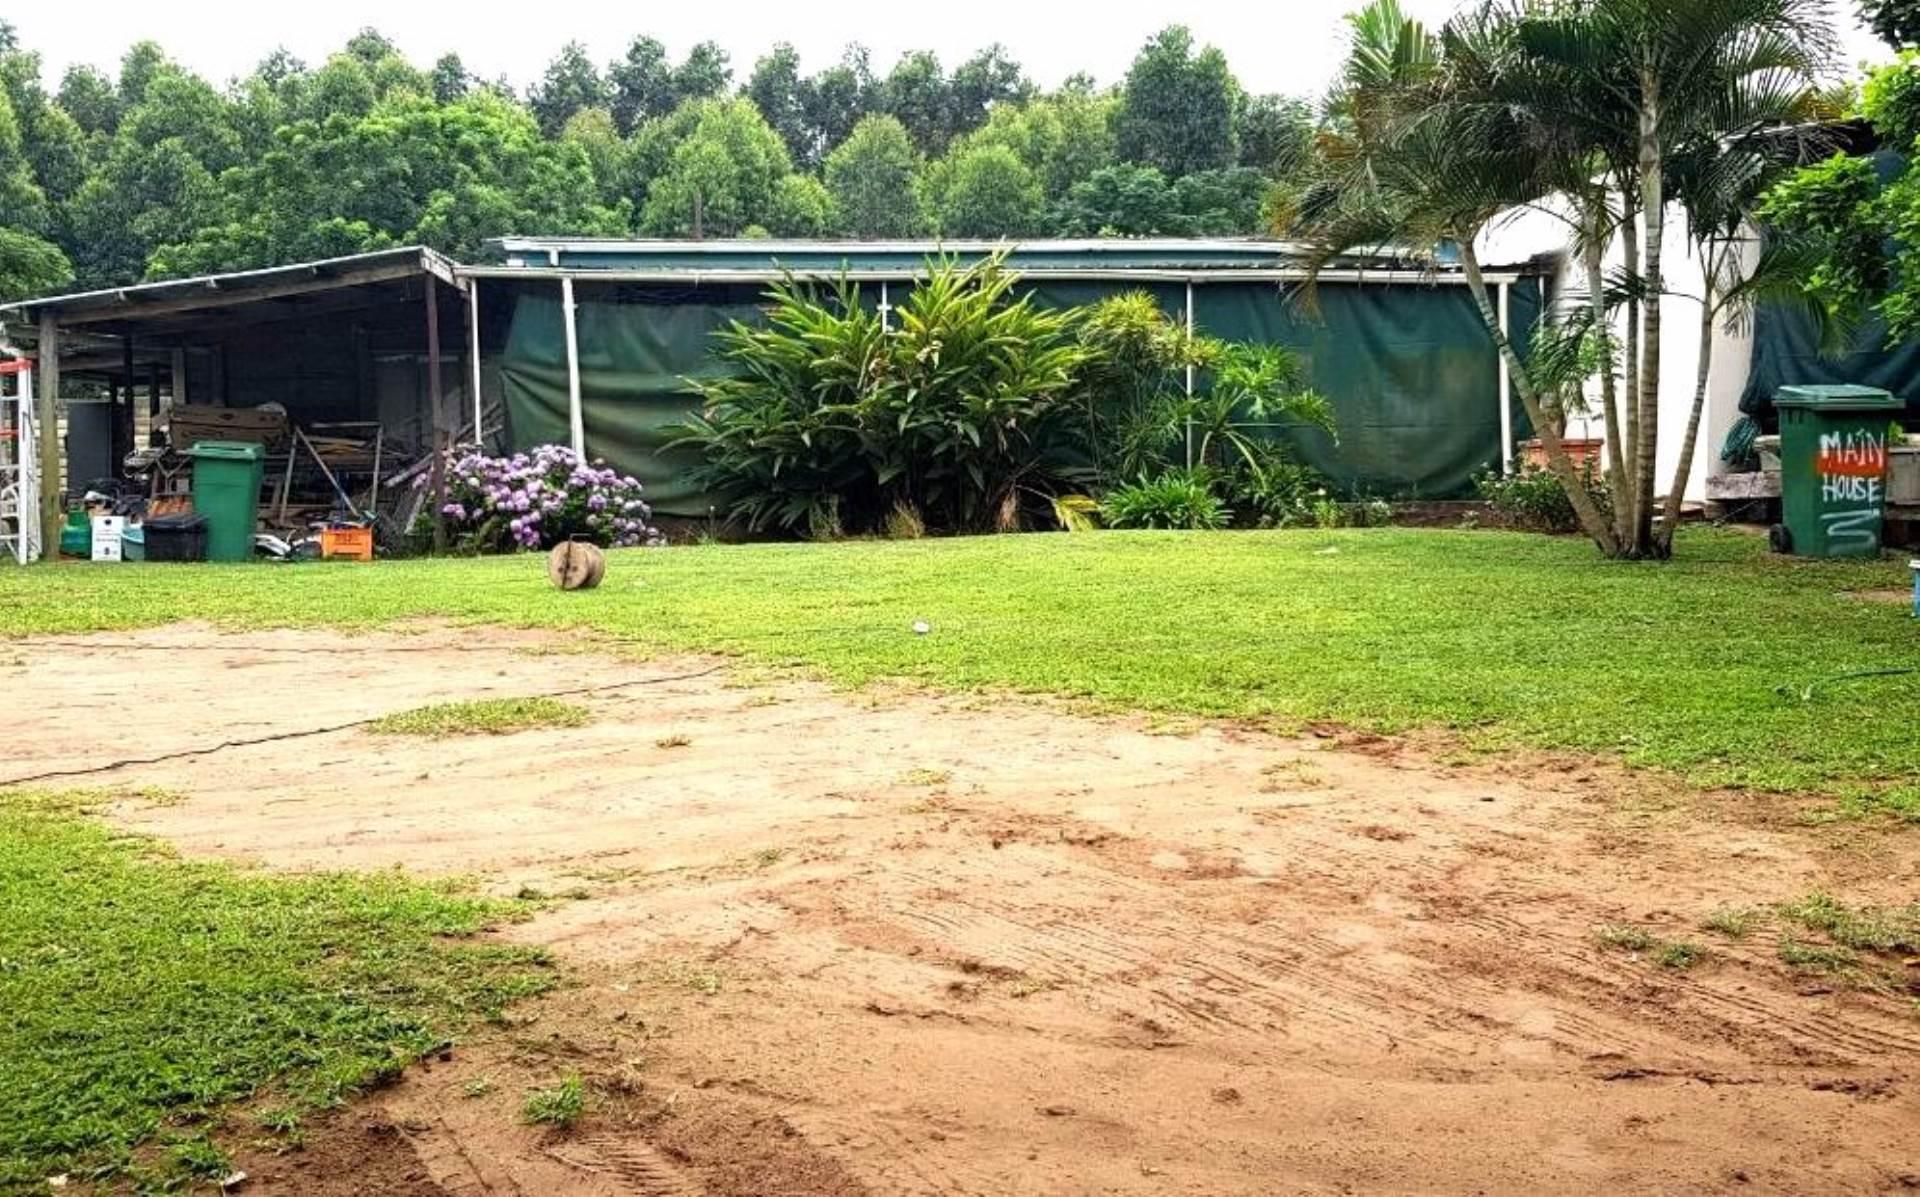 3 BedroomHouse For Sale In Kwambonambi